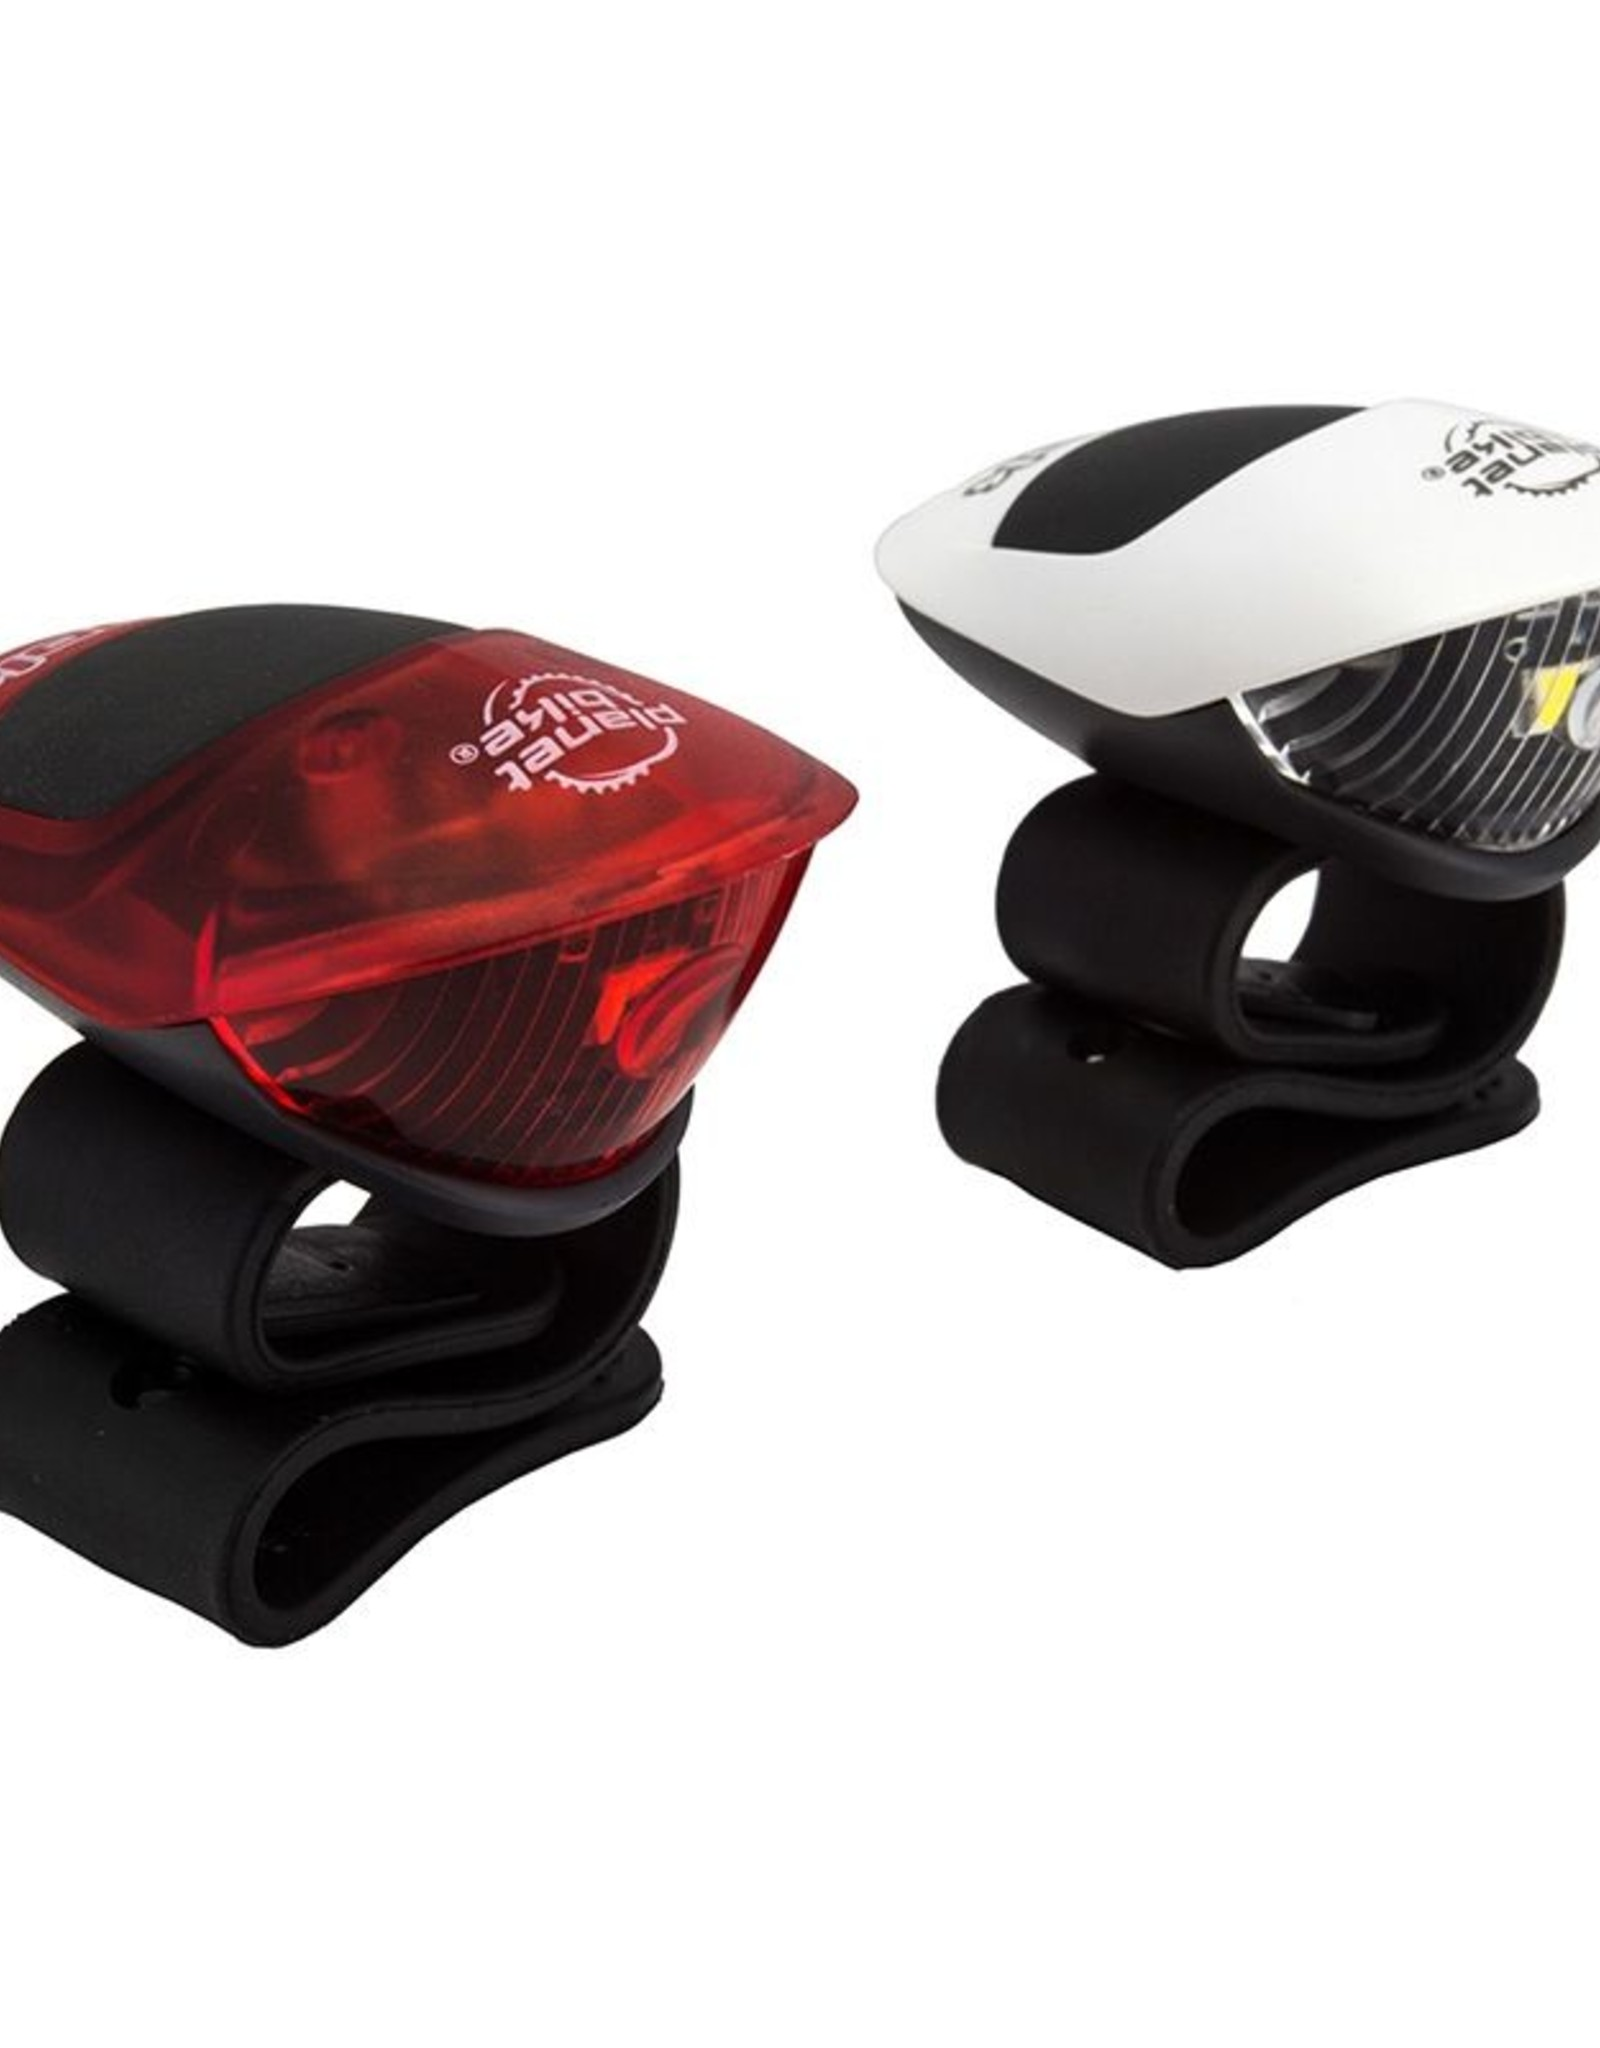 Planet Bike Planet Bike Spok Combo head & tail light set